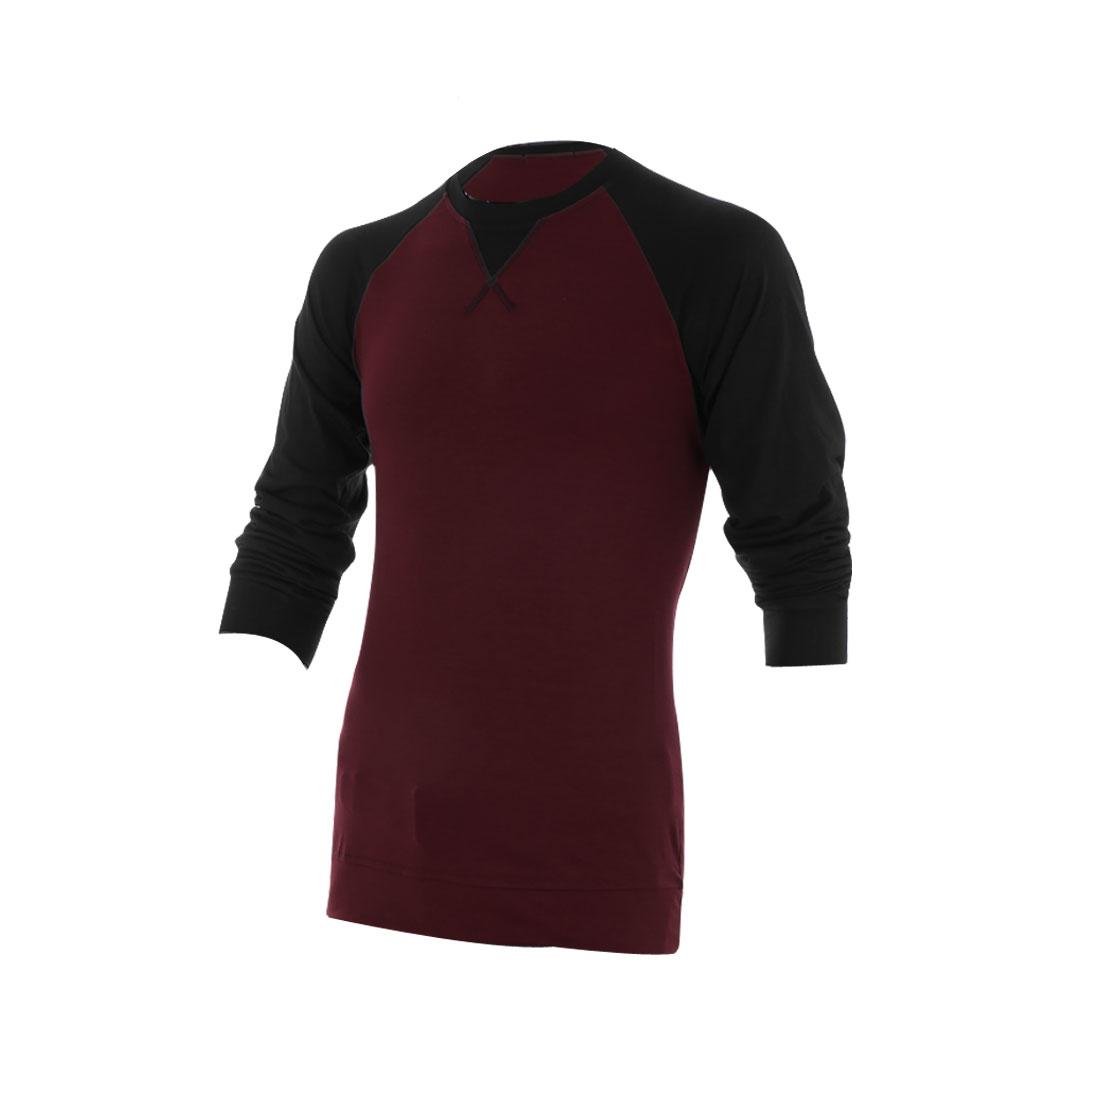 Slipover Stretchy Slim Fit Black Long Raglan Sleeve Burgundy Shirt for Man M